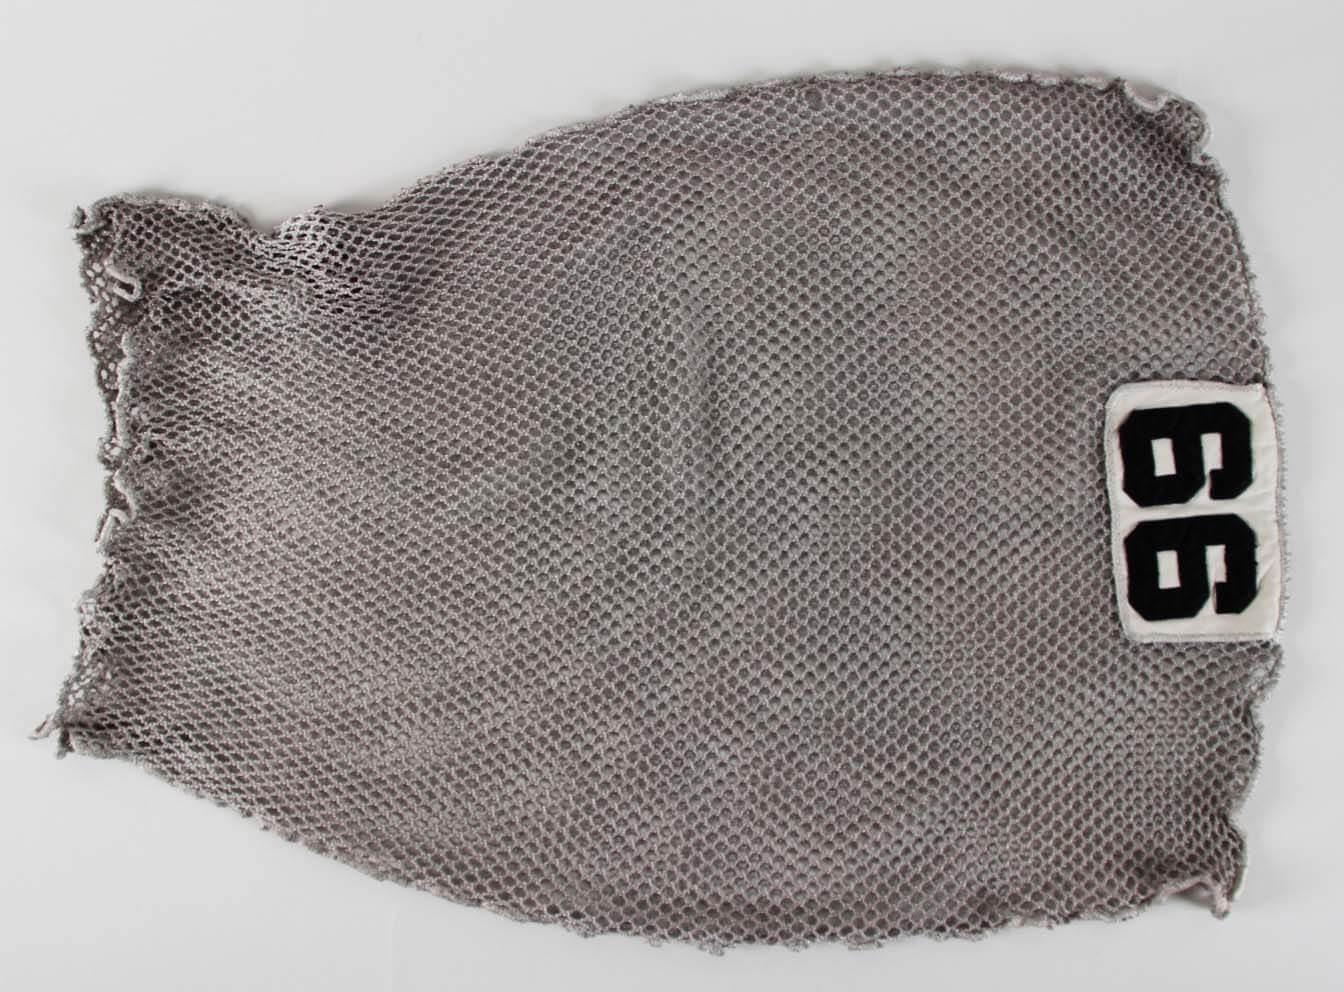 Wayne Gretzky Post Game-Used Los Angeles Kings Laundry Bag